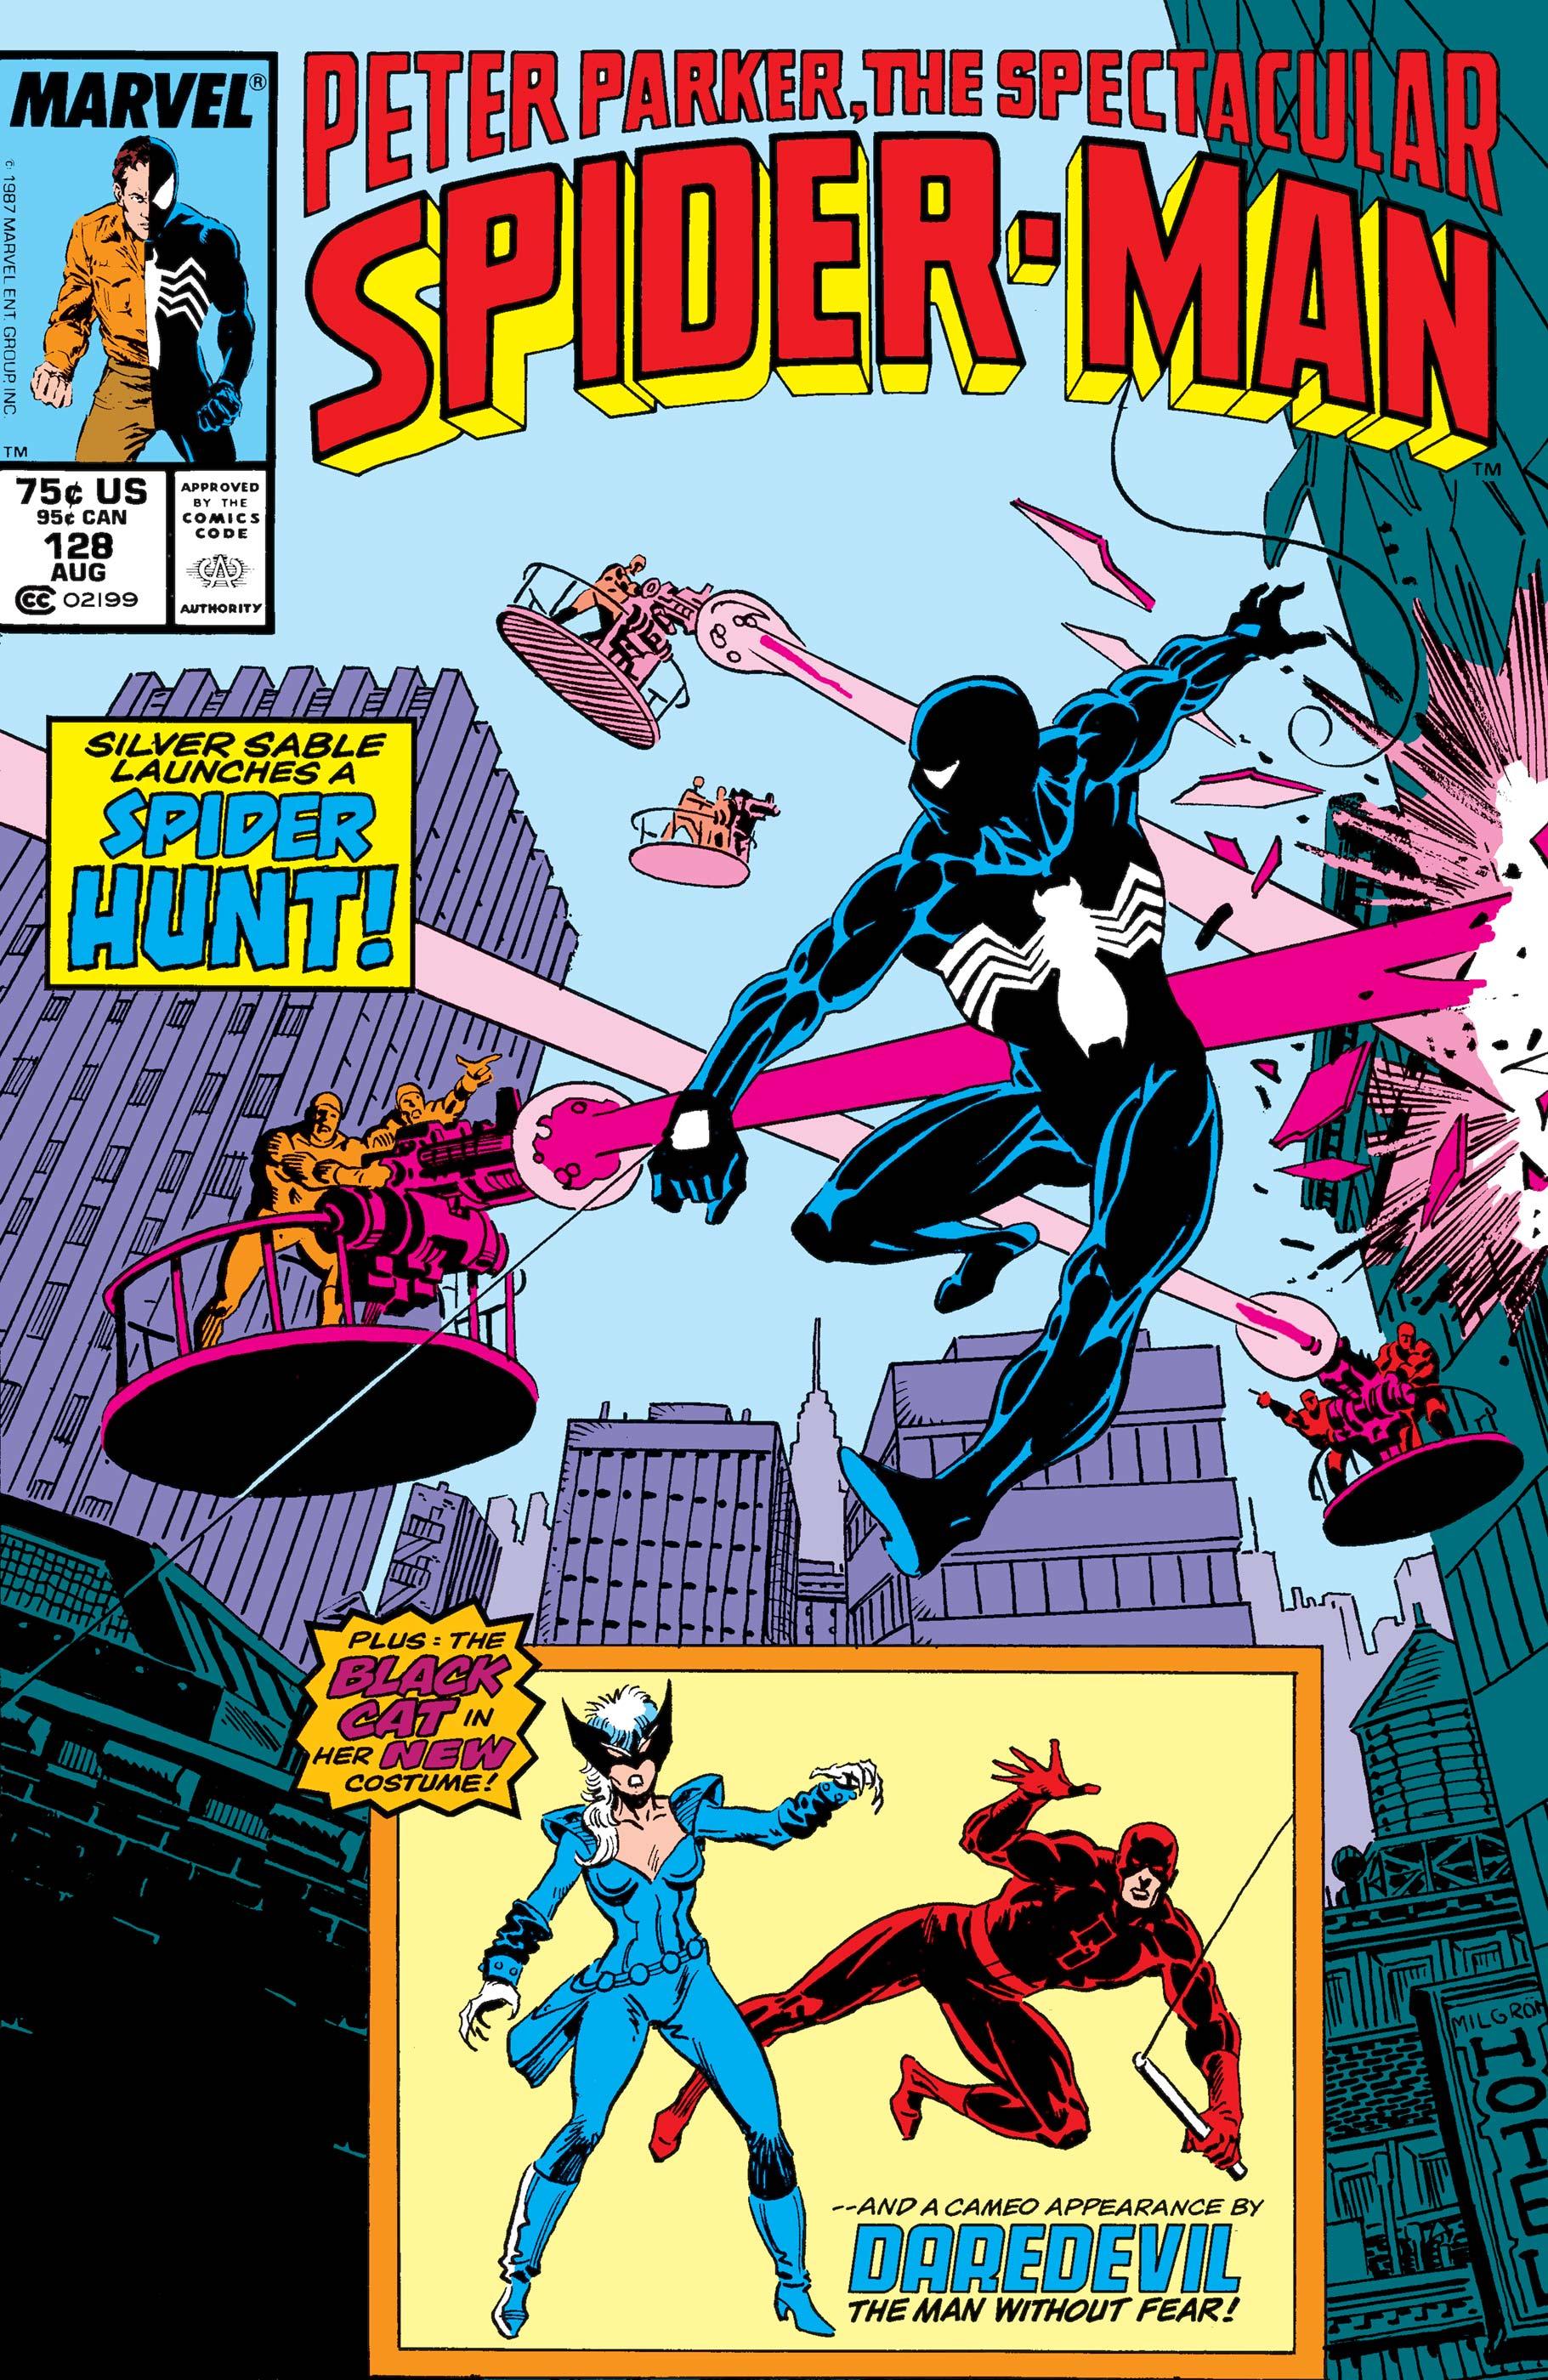 Peter Parker, the Spectacular Spider-Man (1976) #128